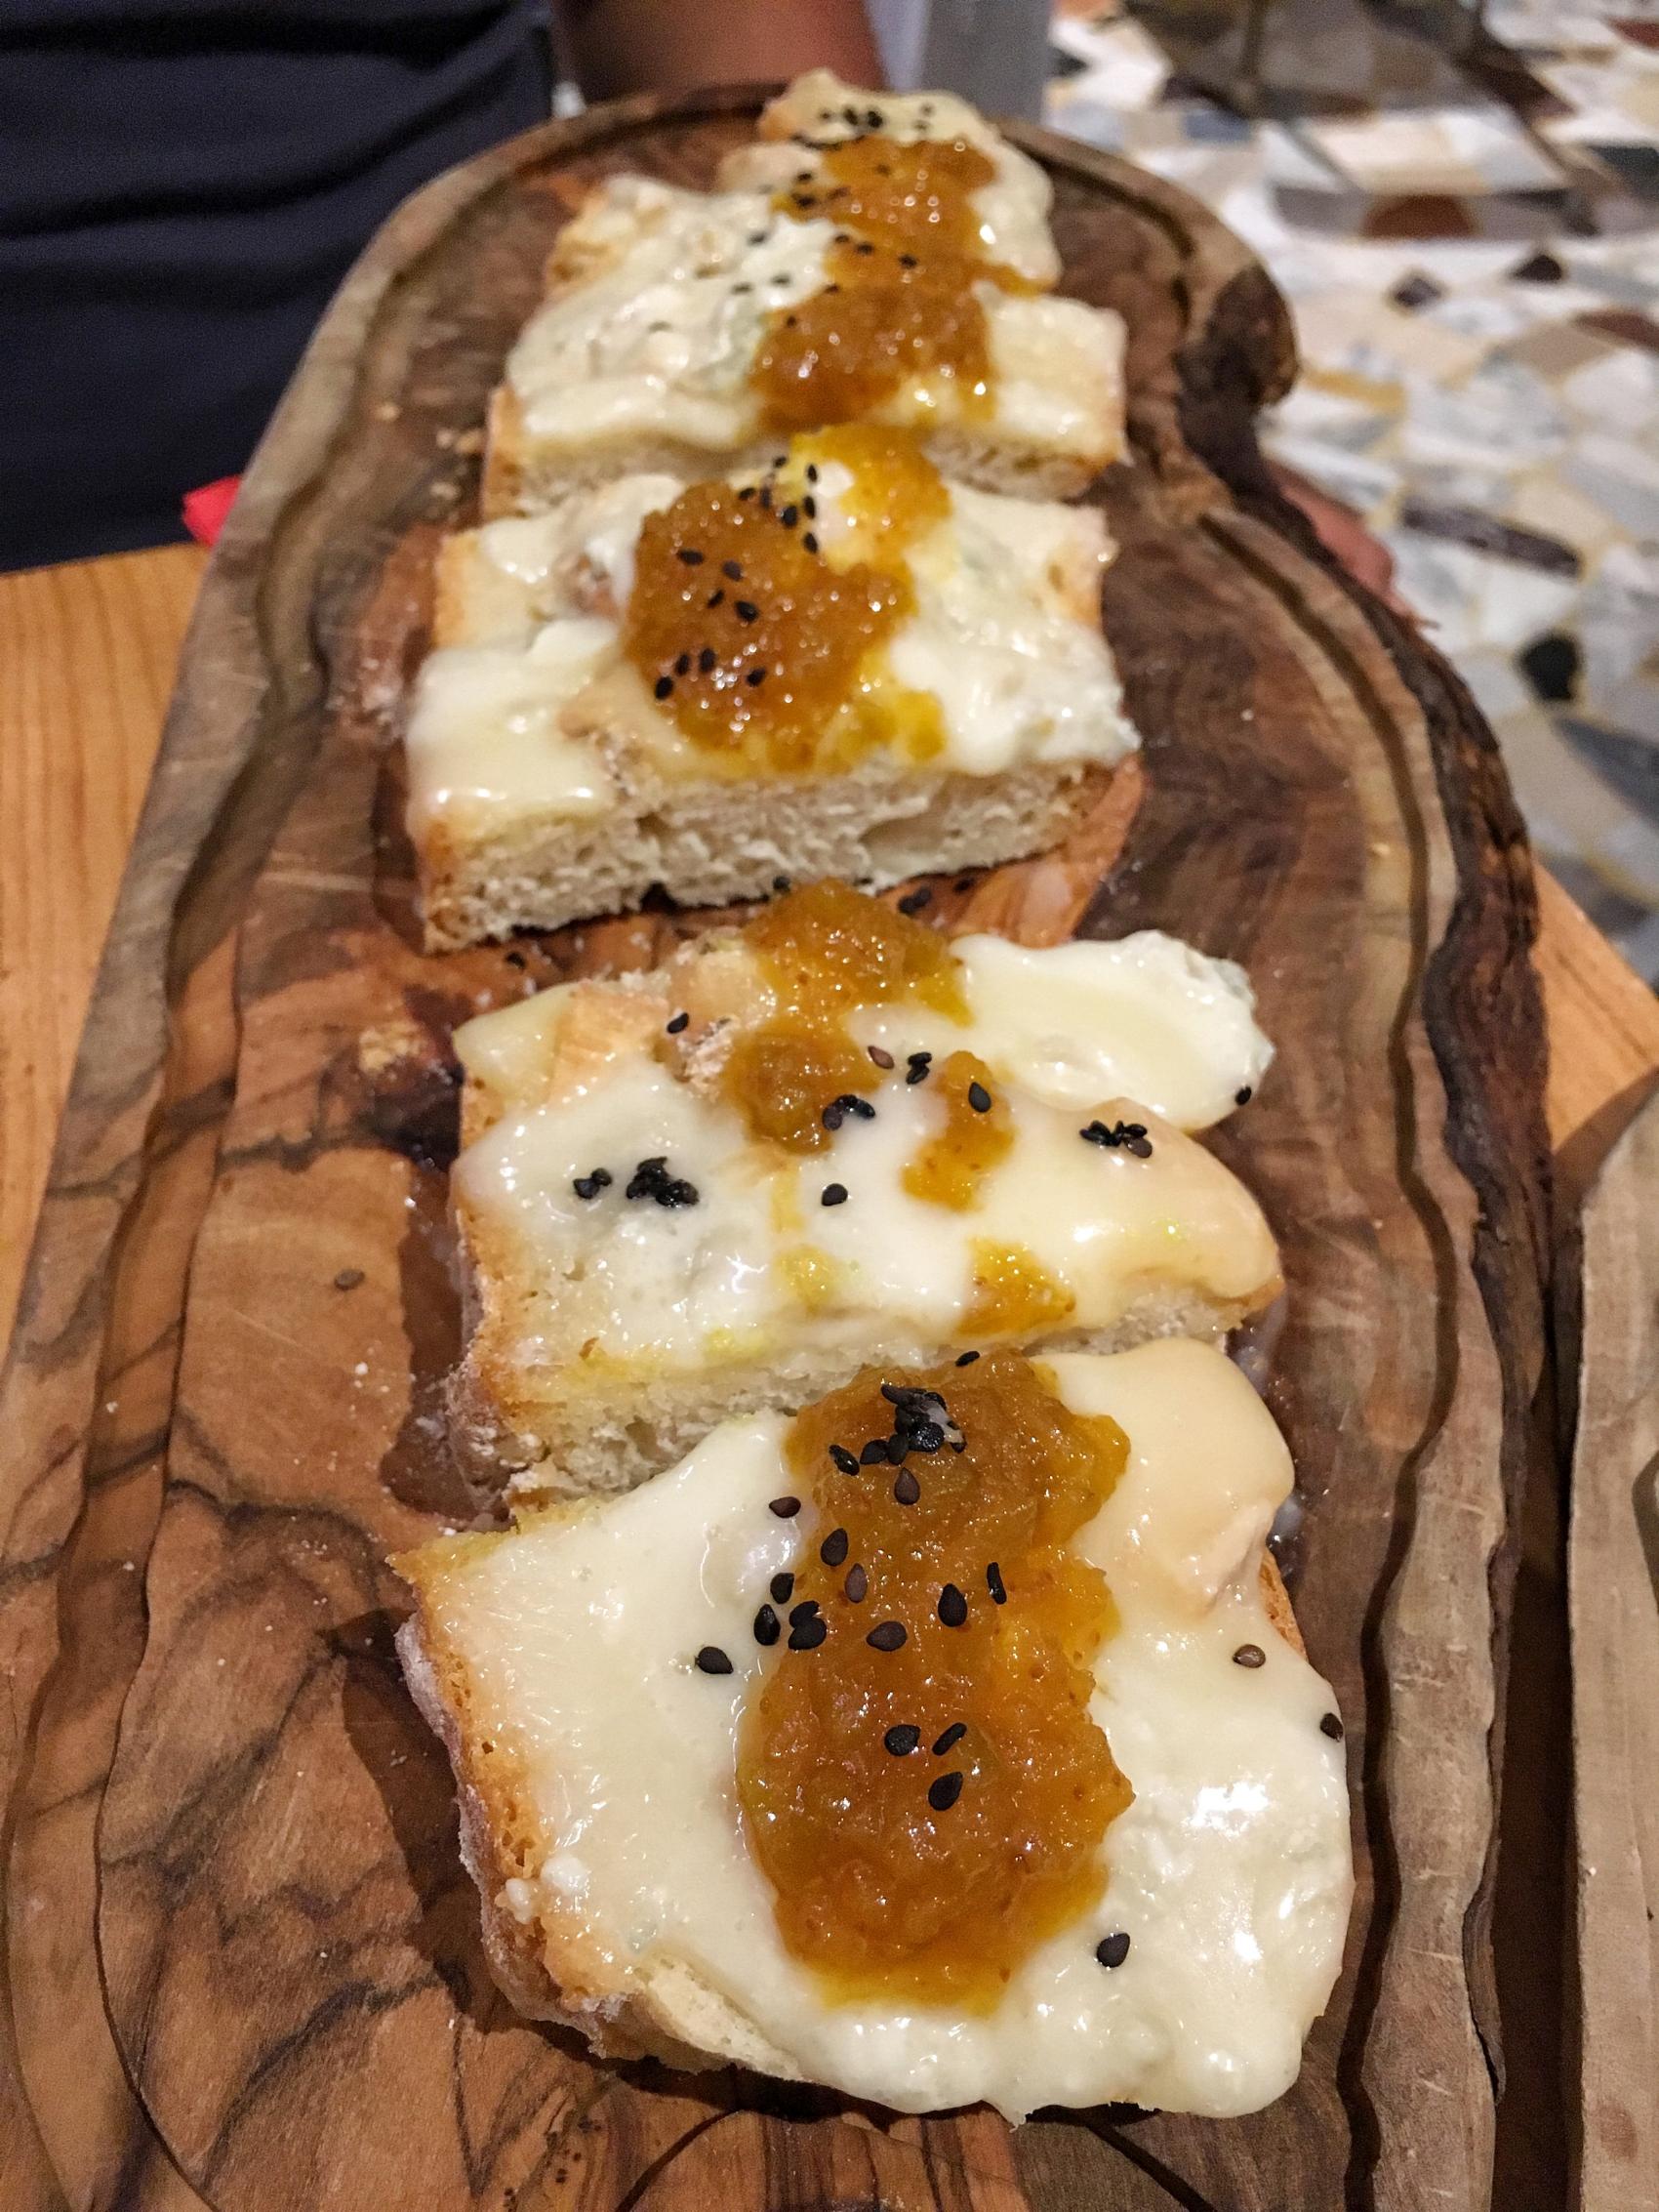 Gorgonzola cheese with fig jam on crostini